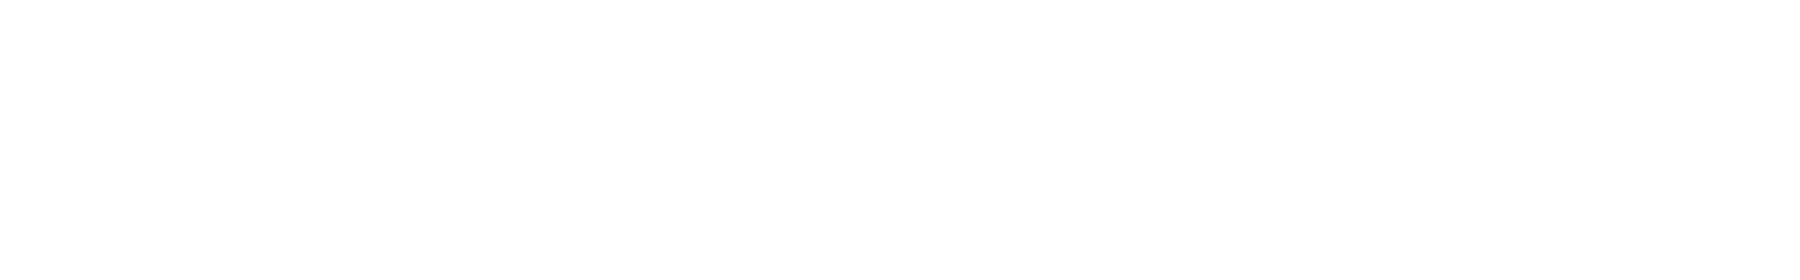 vedh bass cut 032 g